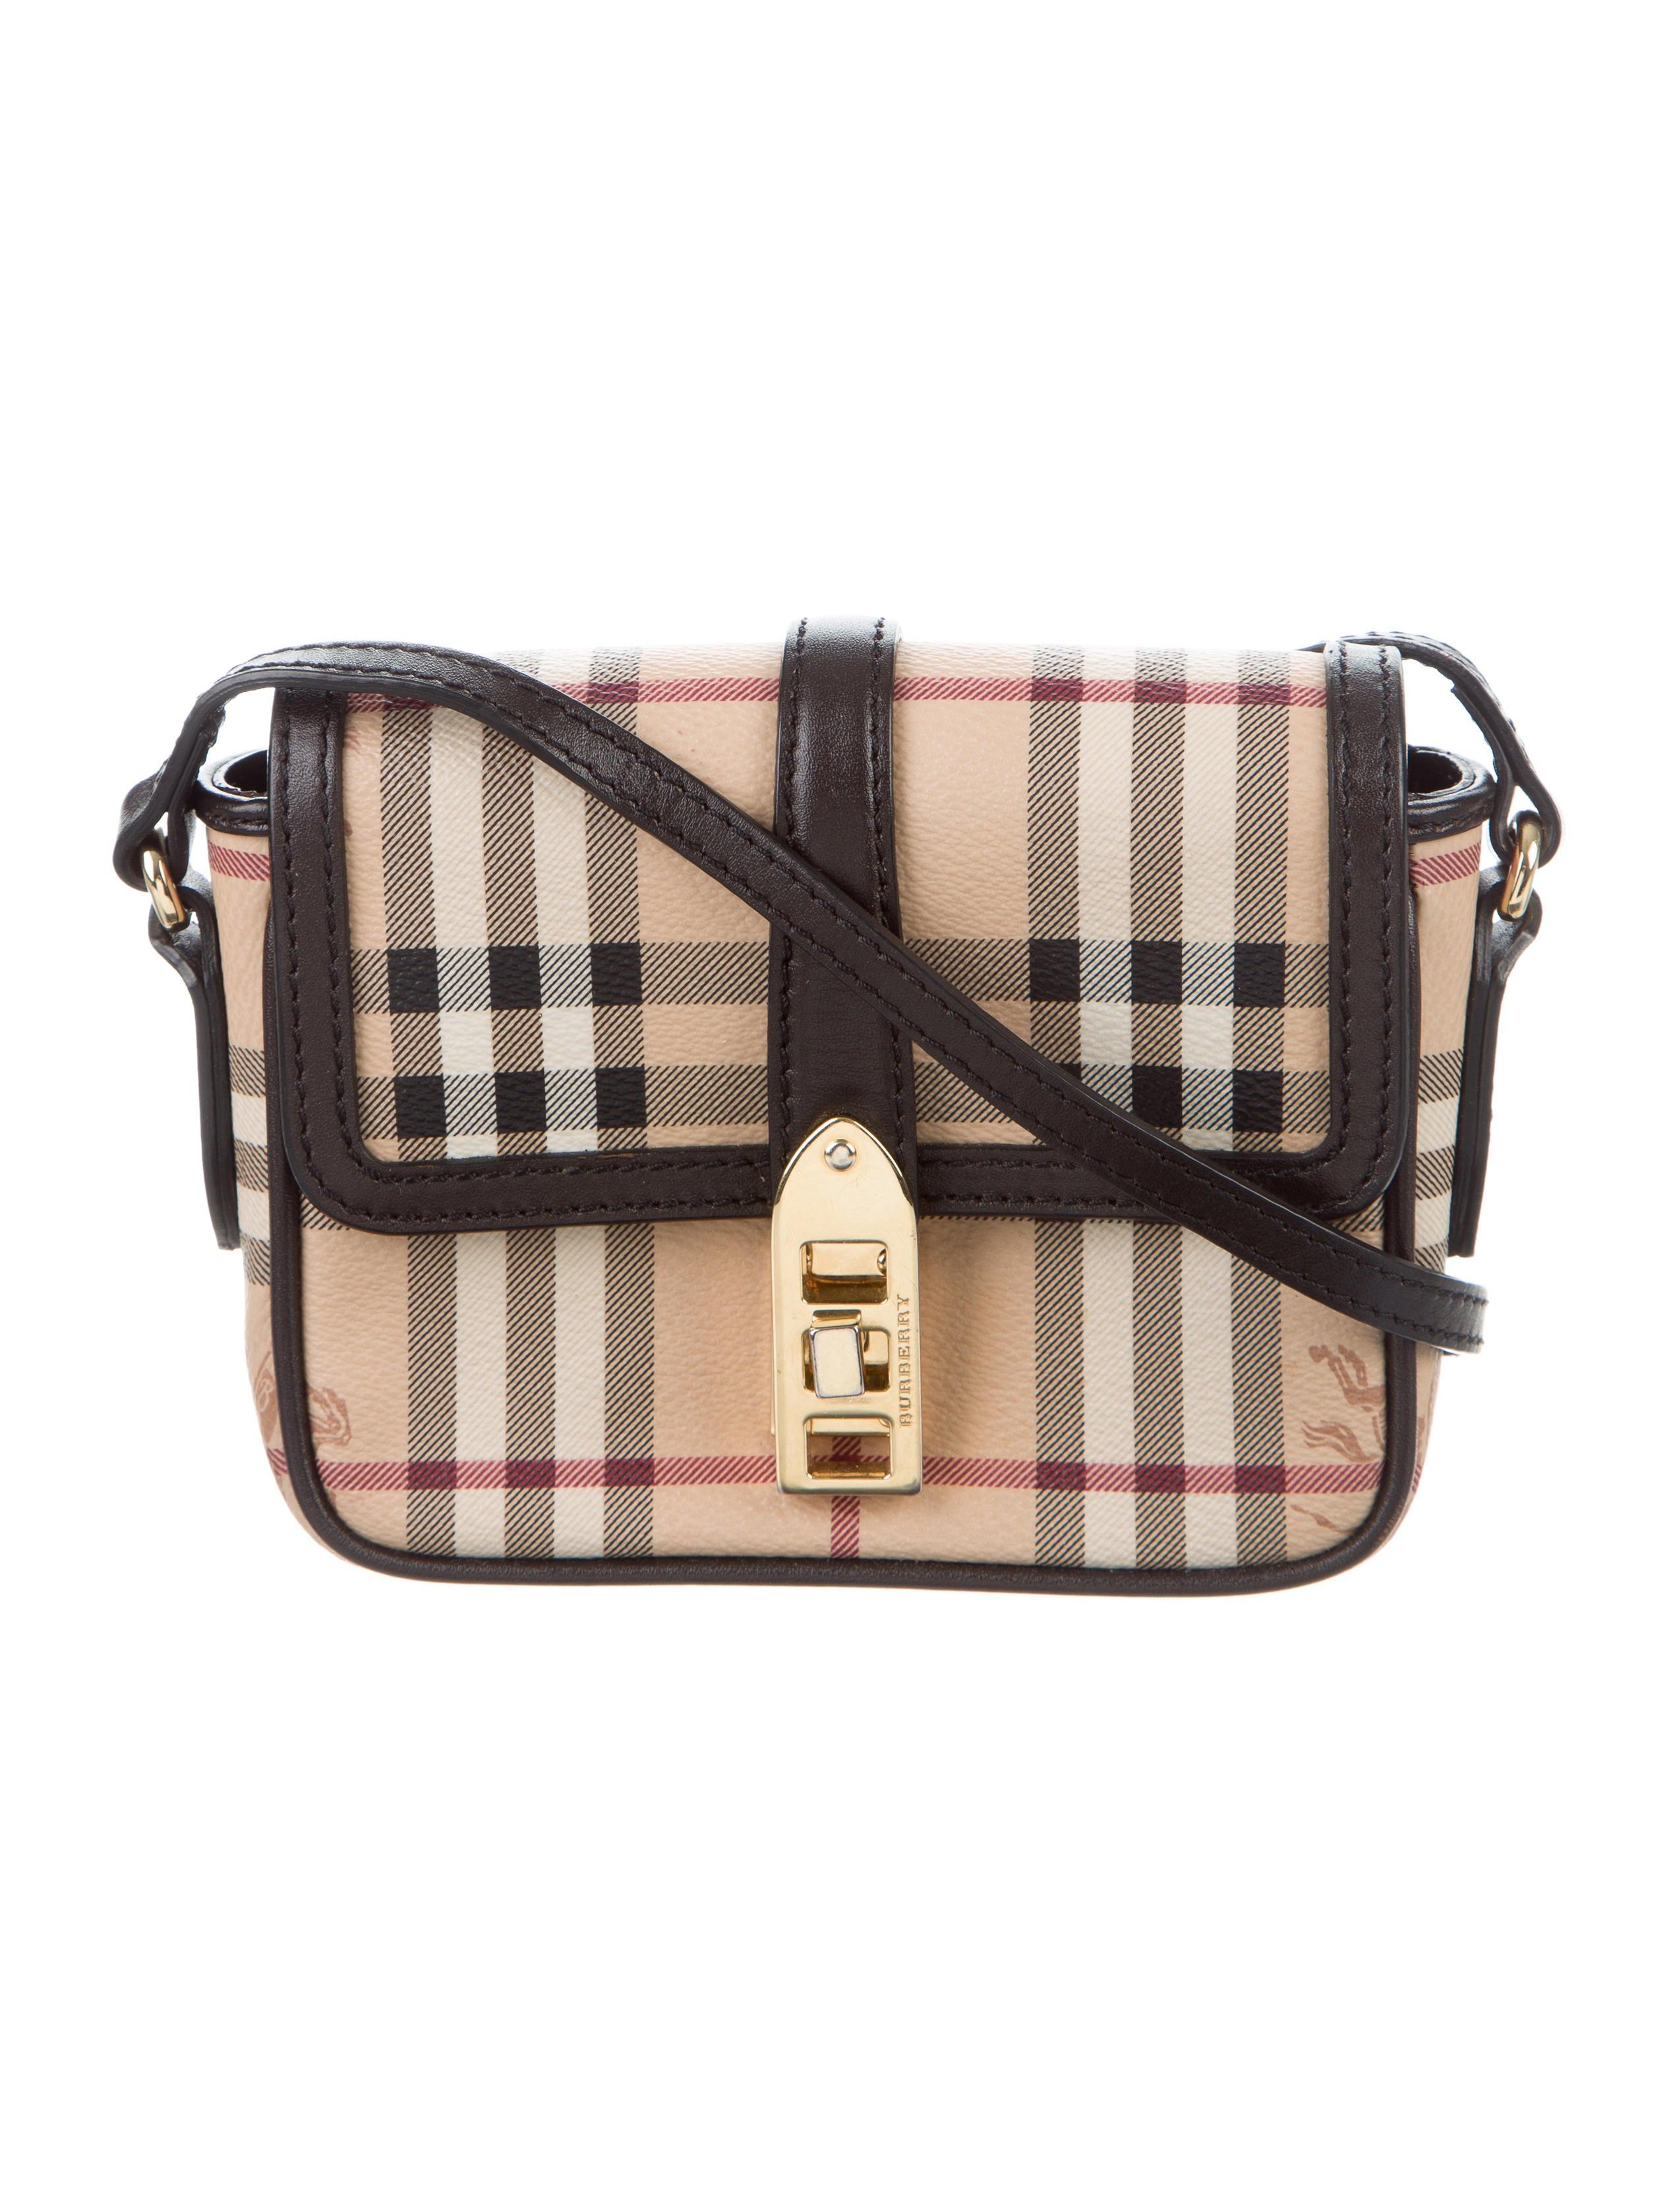 df2c1c687ccd Burberry Mini Berkeley Haymarket Check Crossbody Bag - Handbags ...